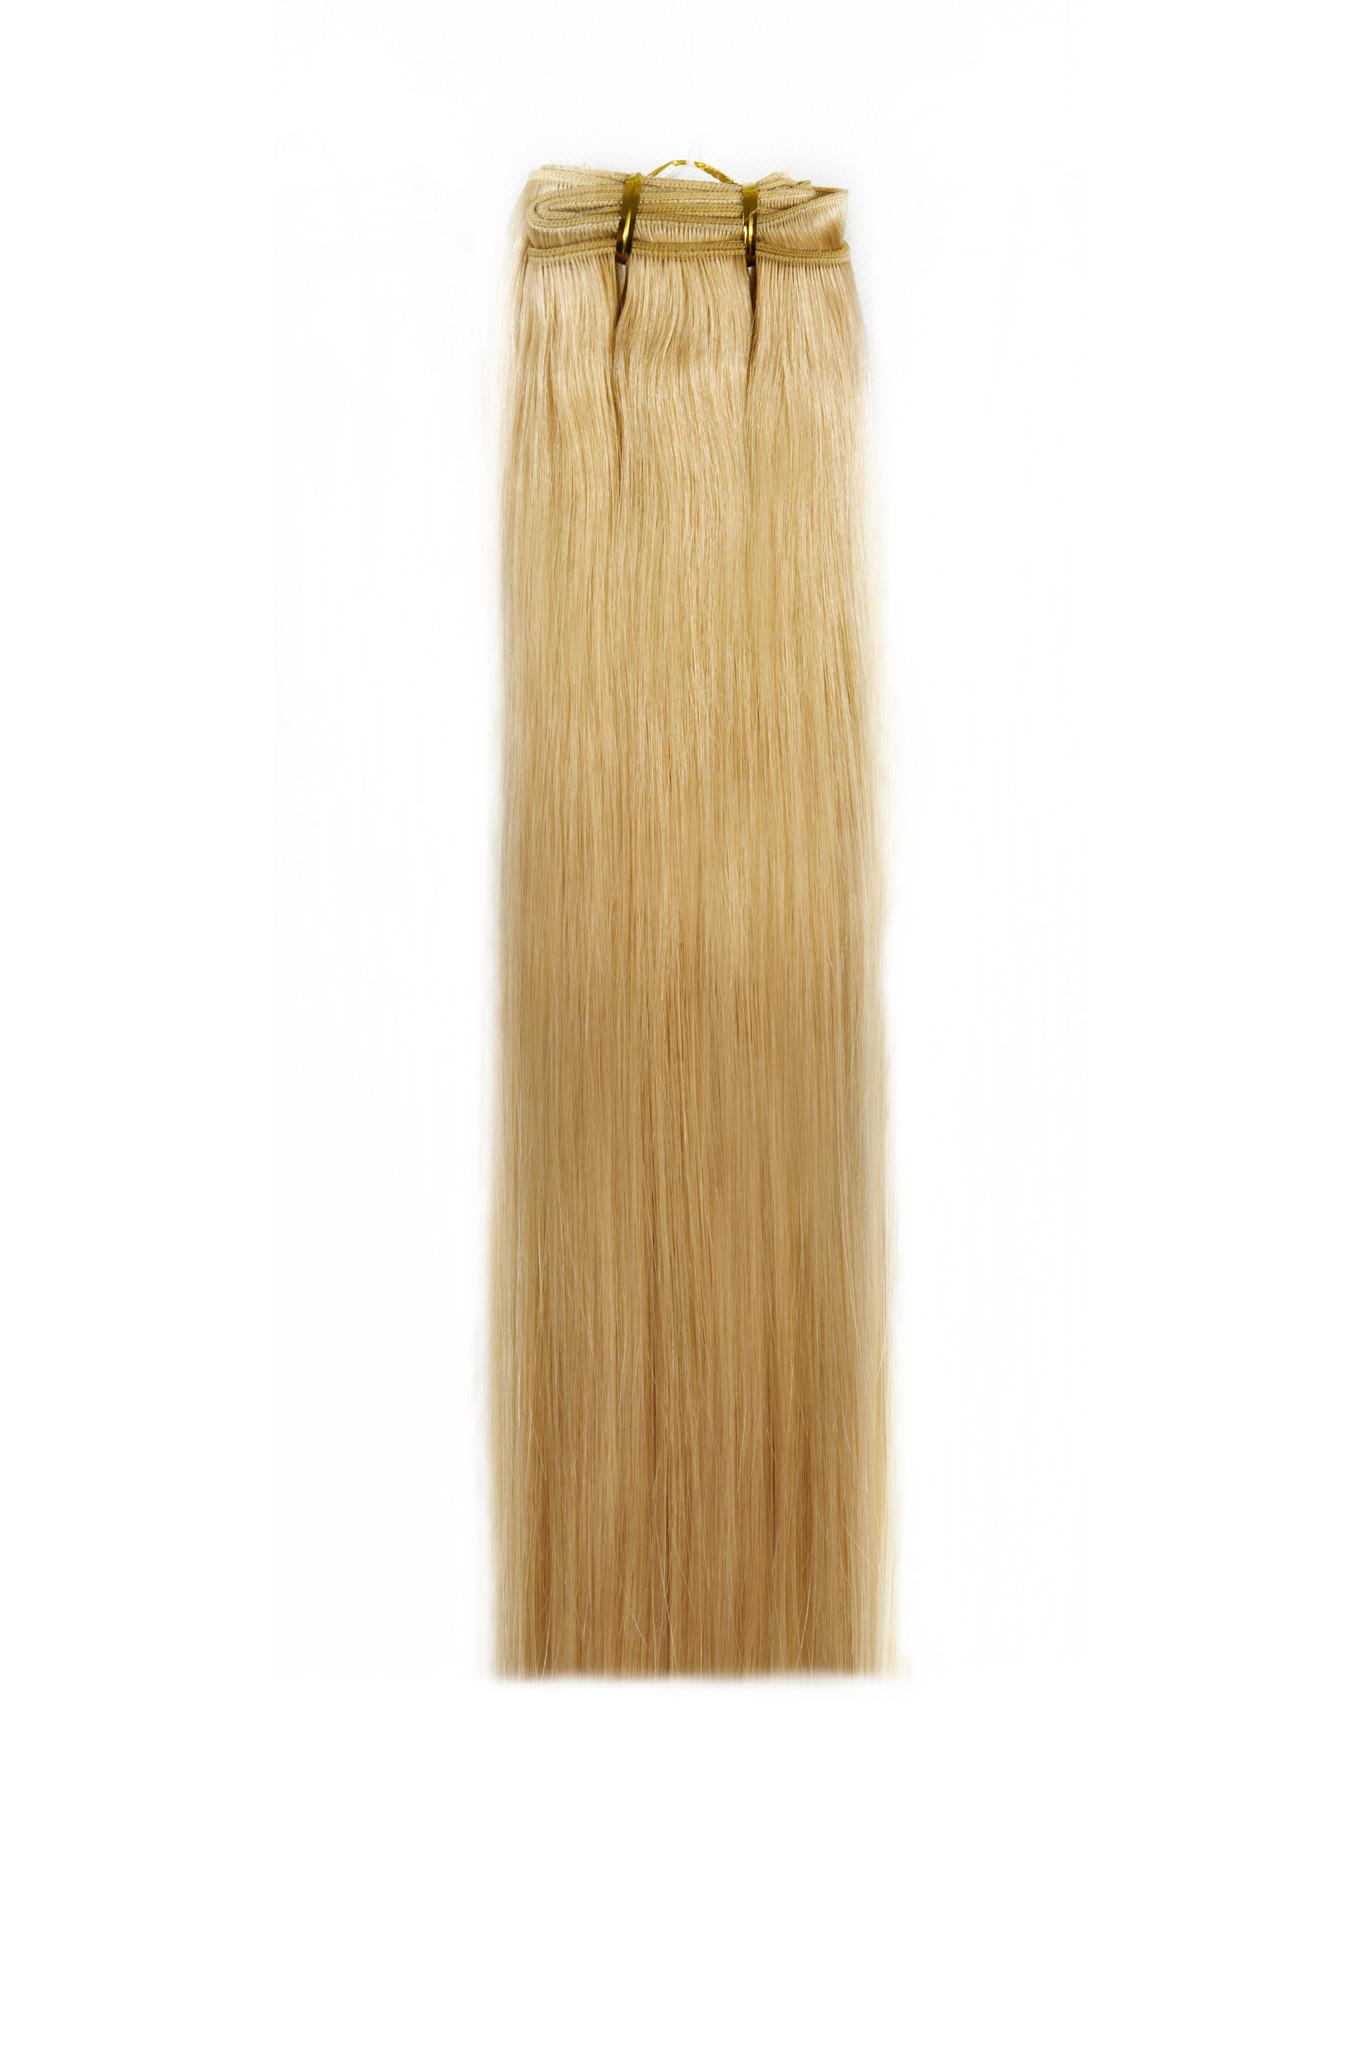 SilverFox Weave - #22 Hollywood Blonde